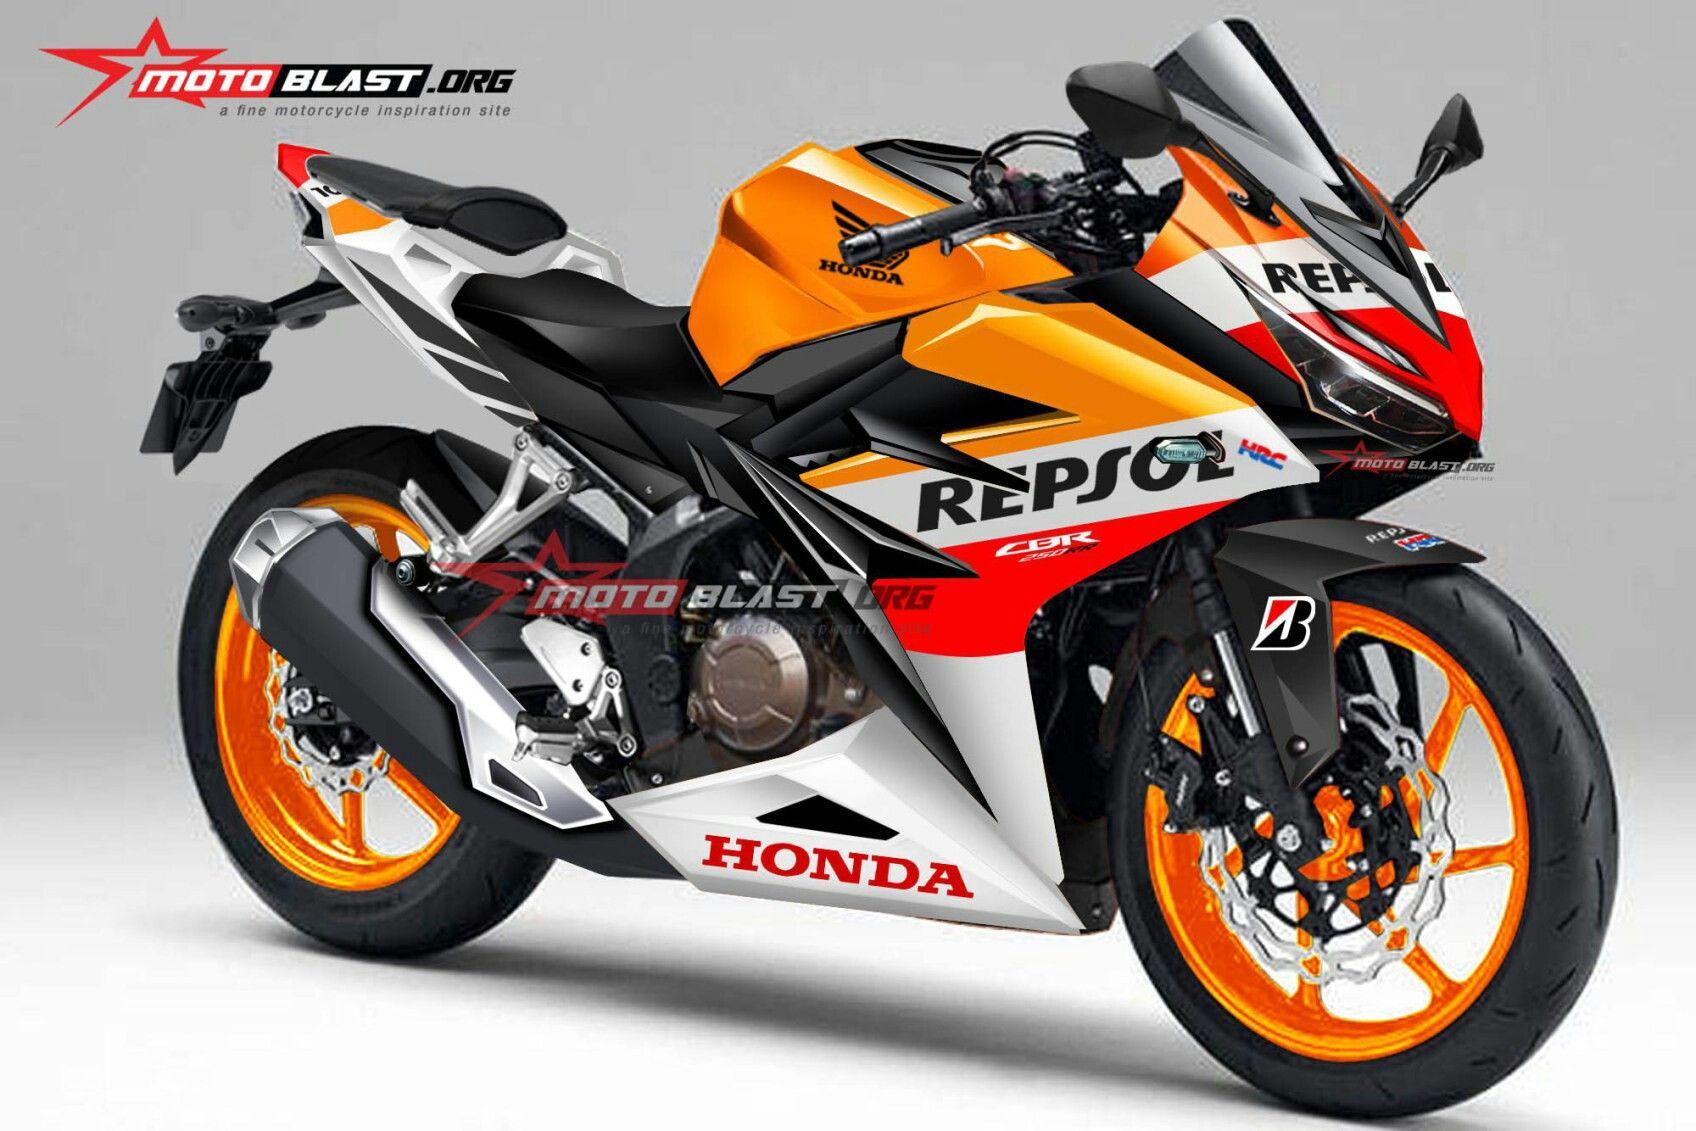 2016 Honda CBR250RR Repsol | repsol honda | Pinterest | Honda, Cbr ...